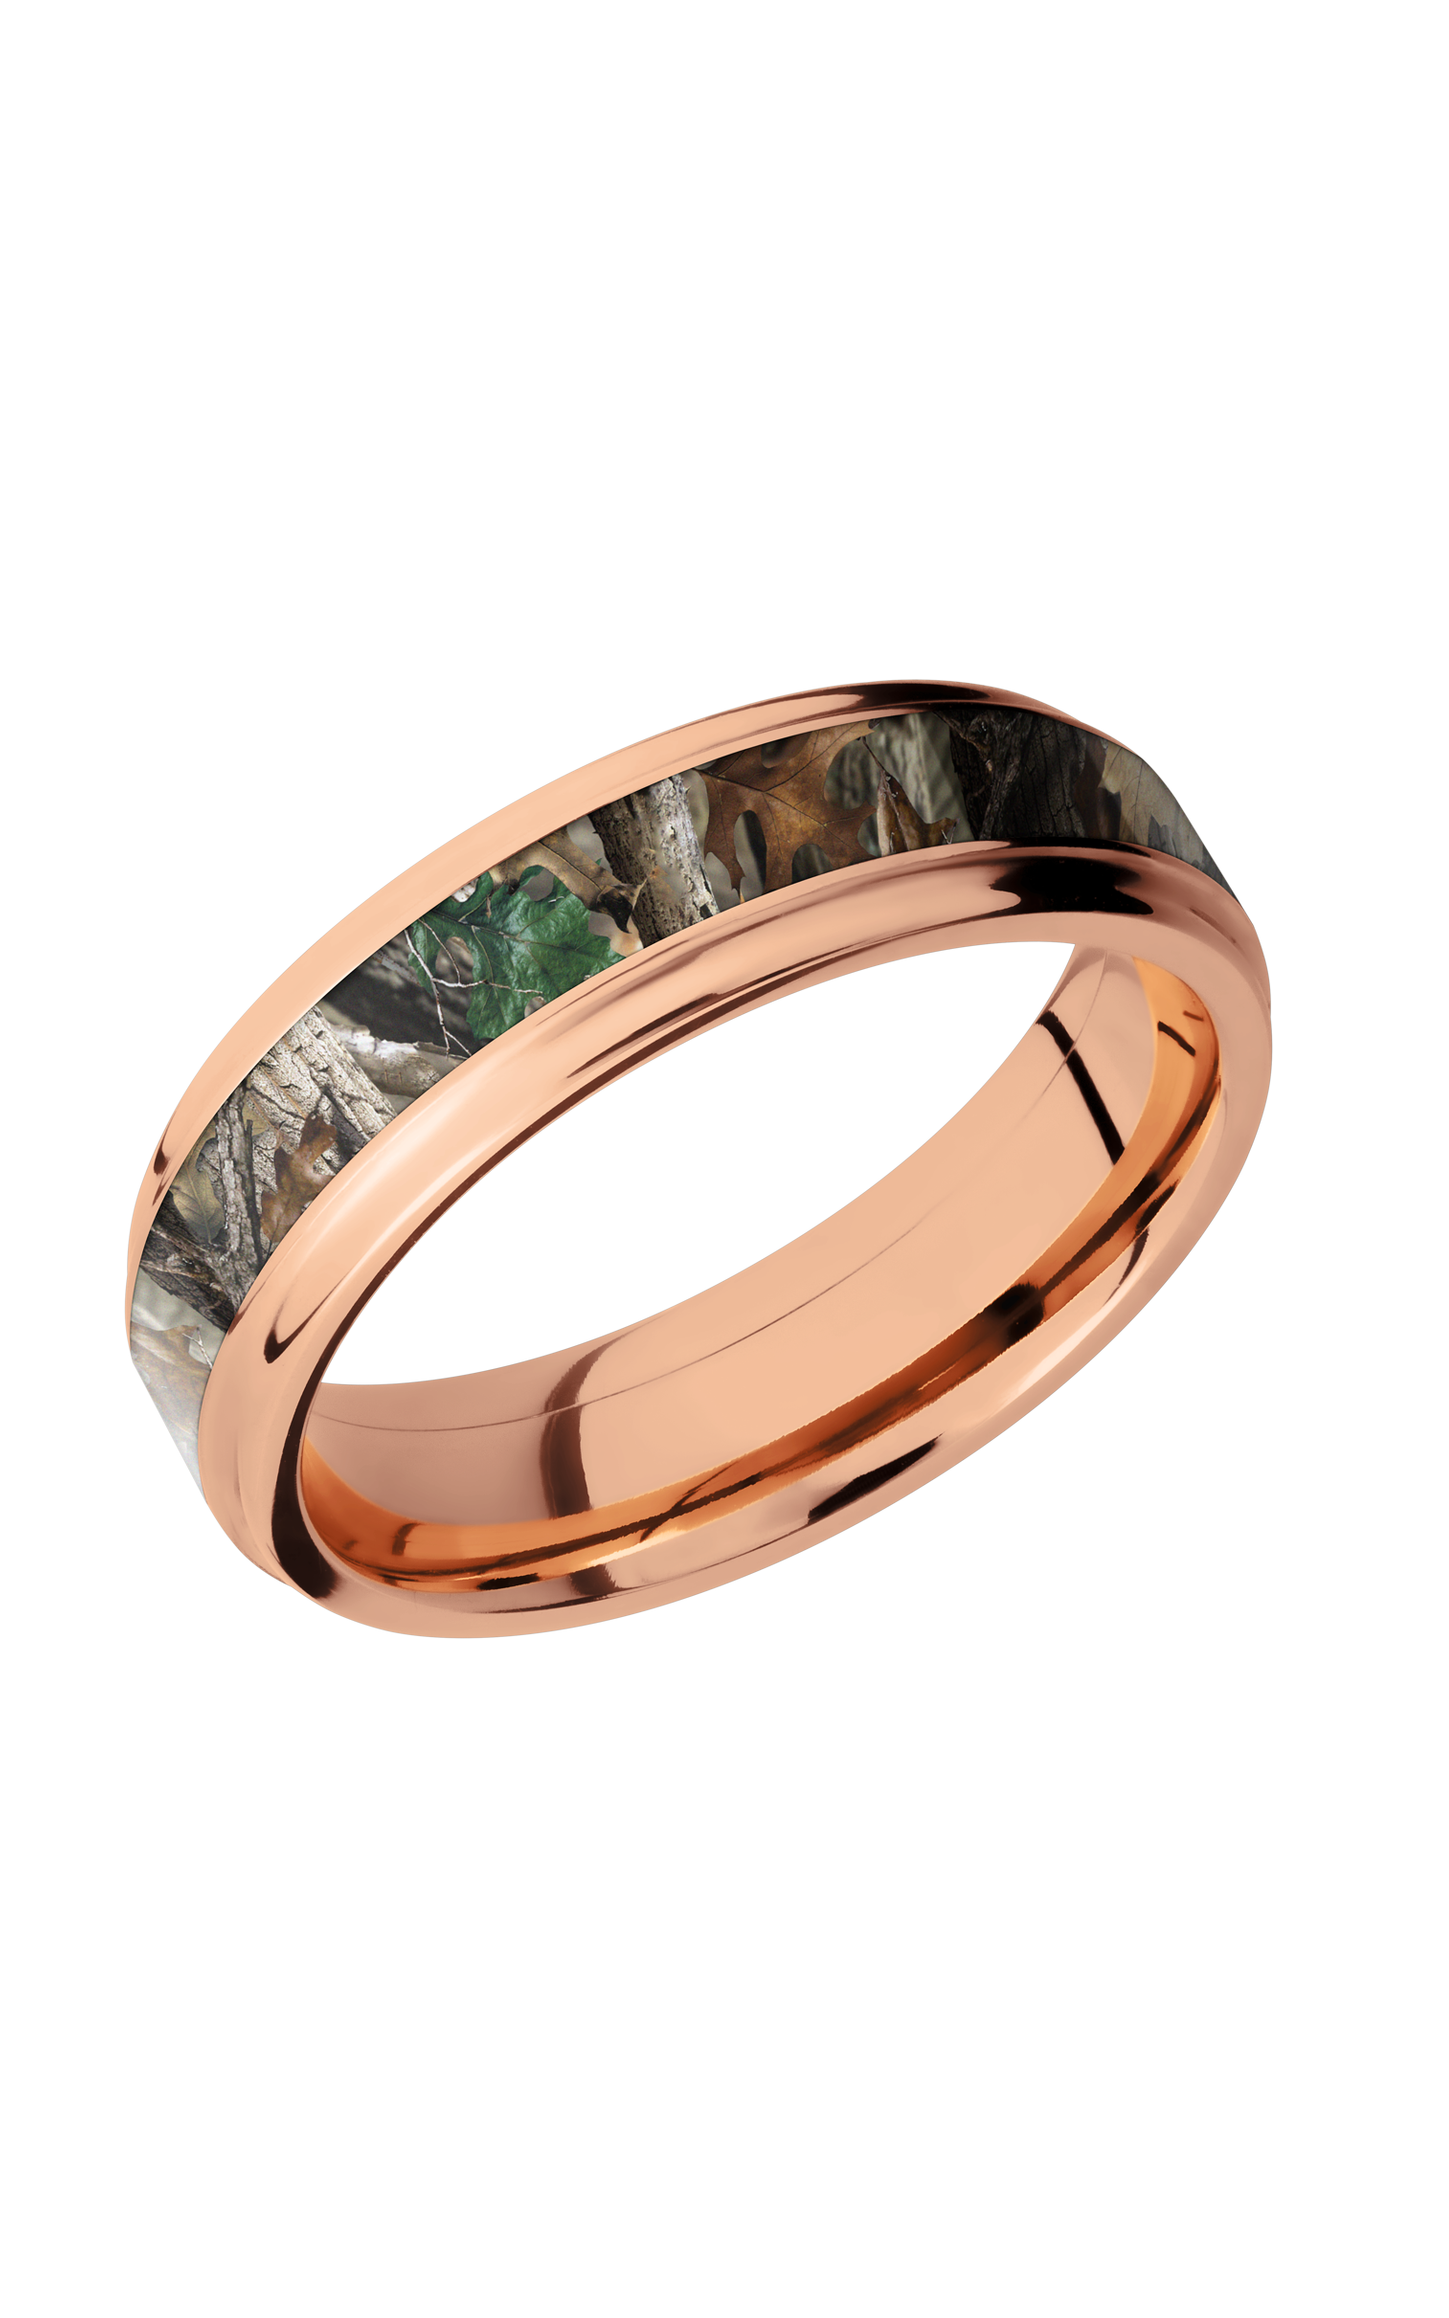 Lashbrook Precious Metals 14KR6FGE13_RTTIMBER product image